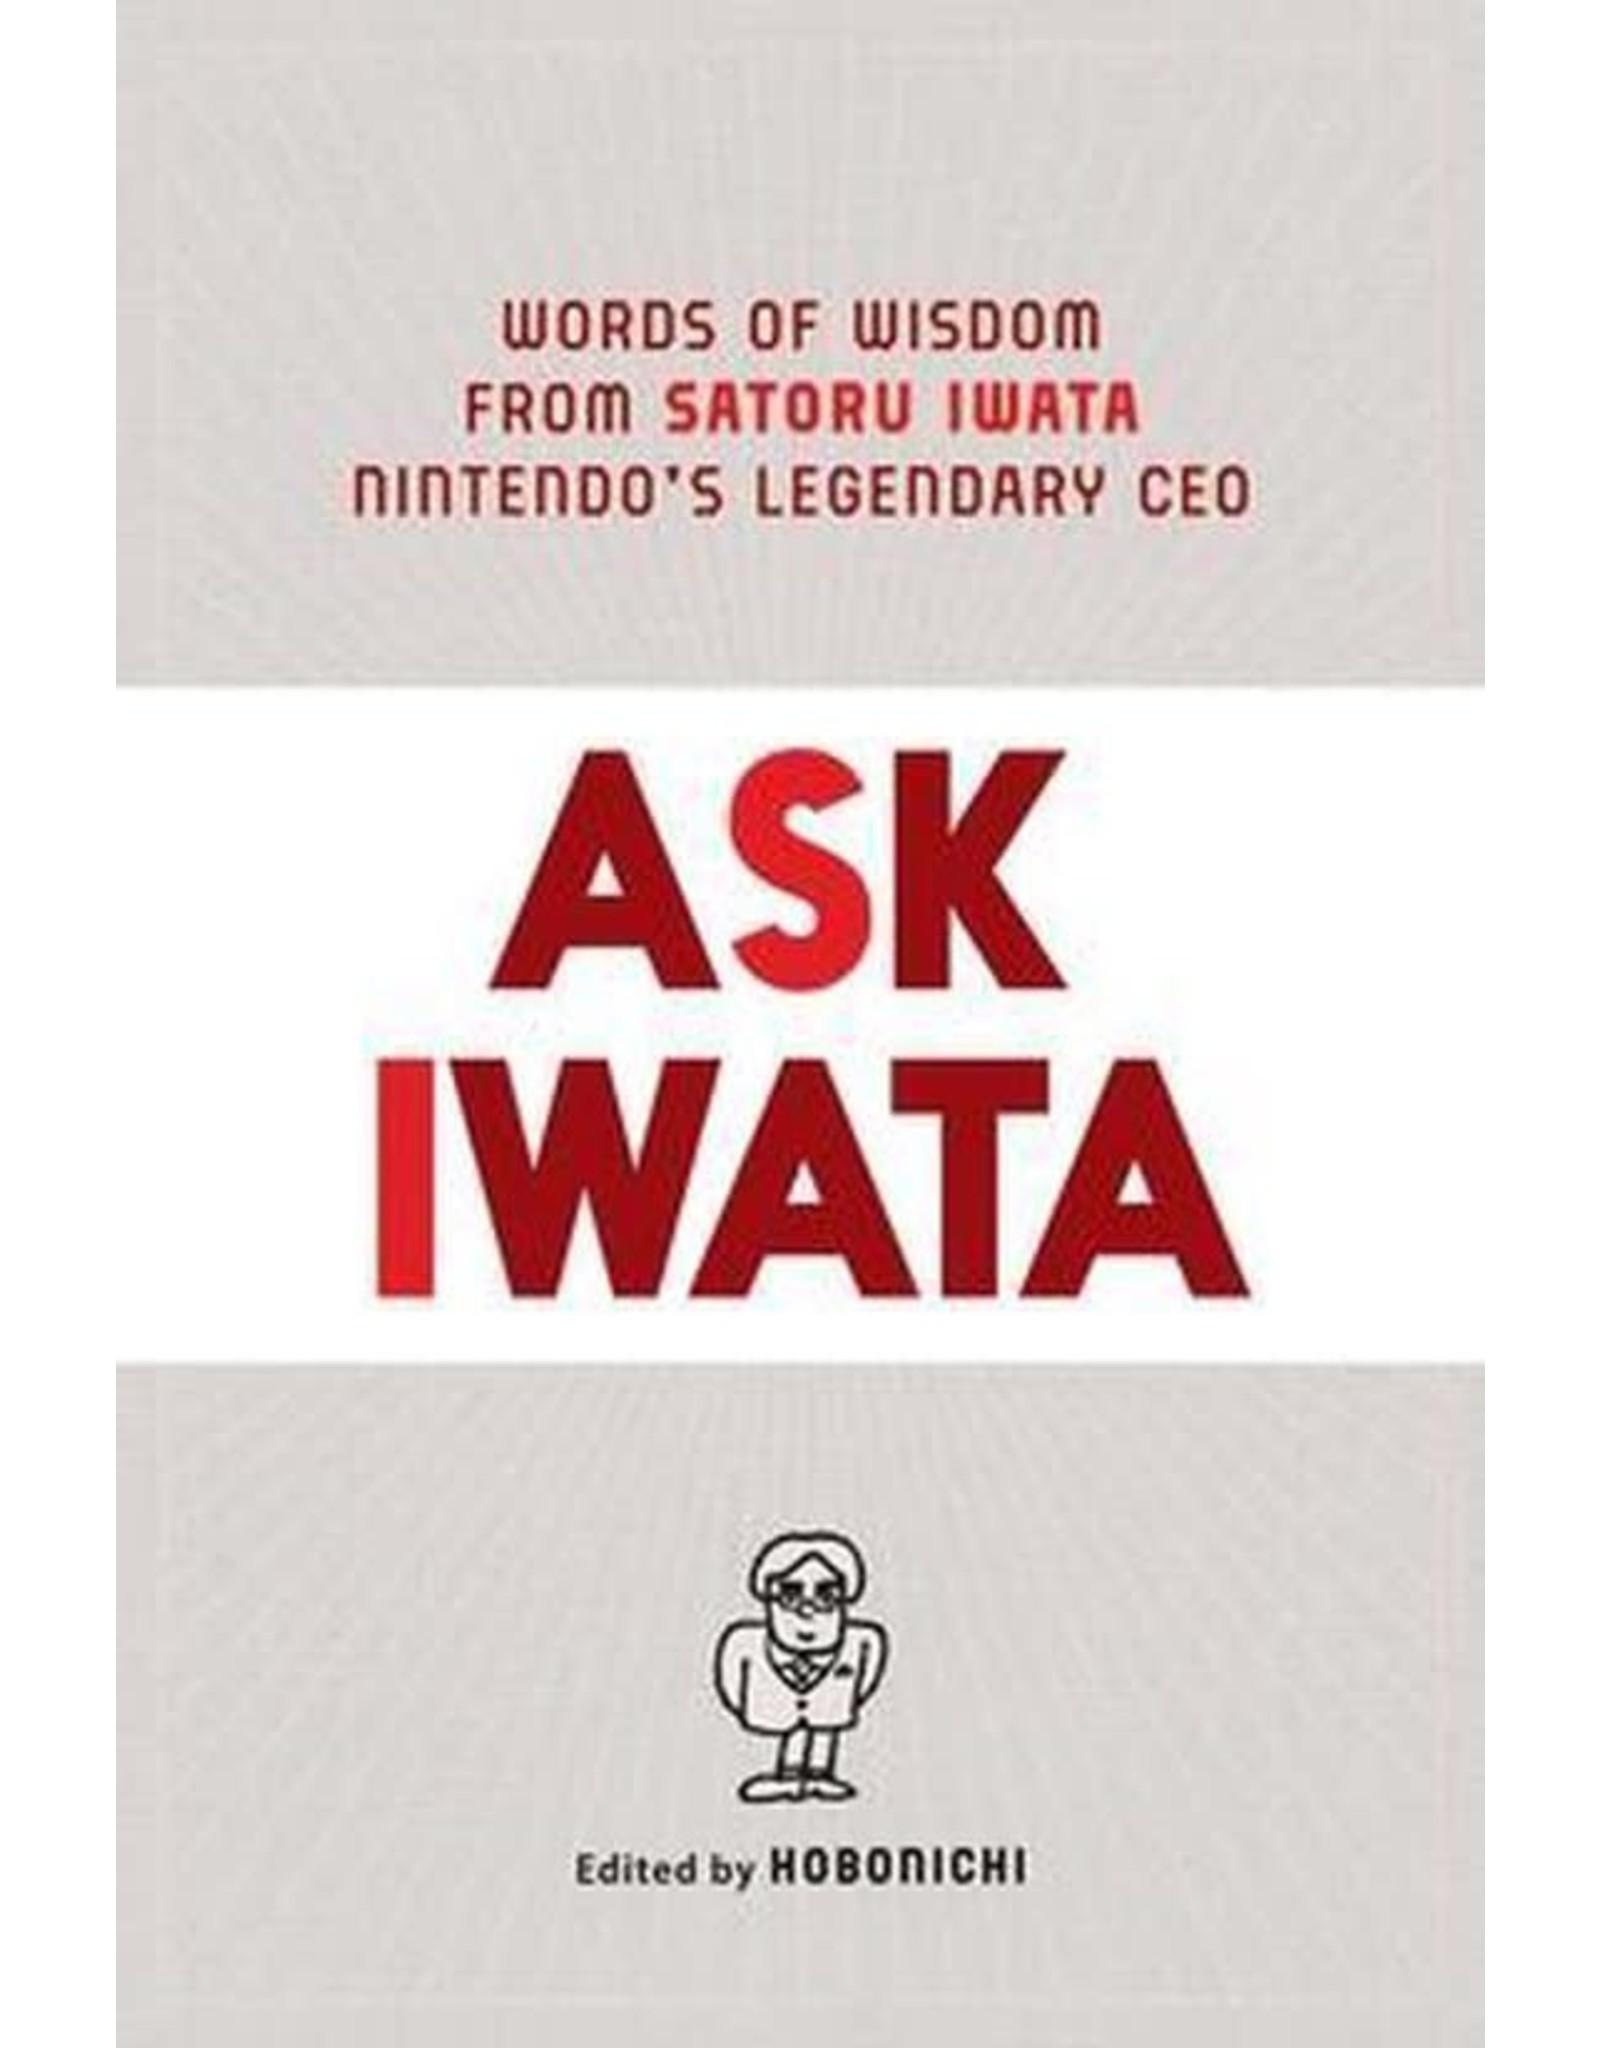 Ask Iwata - Words of Wisdom From Satoru Iwata, Nintendo's Legendary CEO (English)